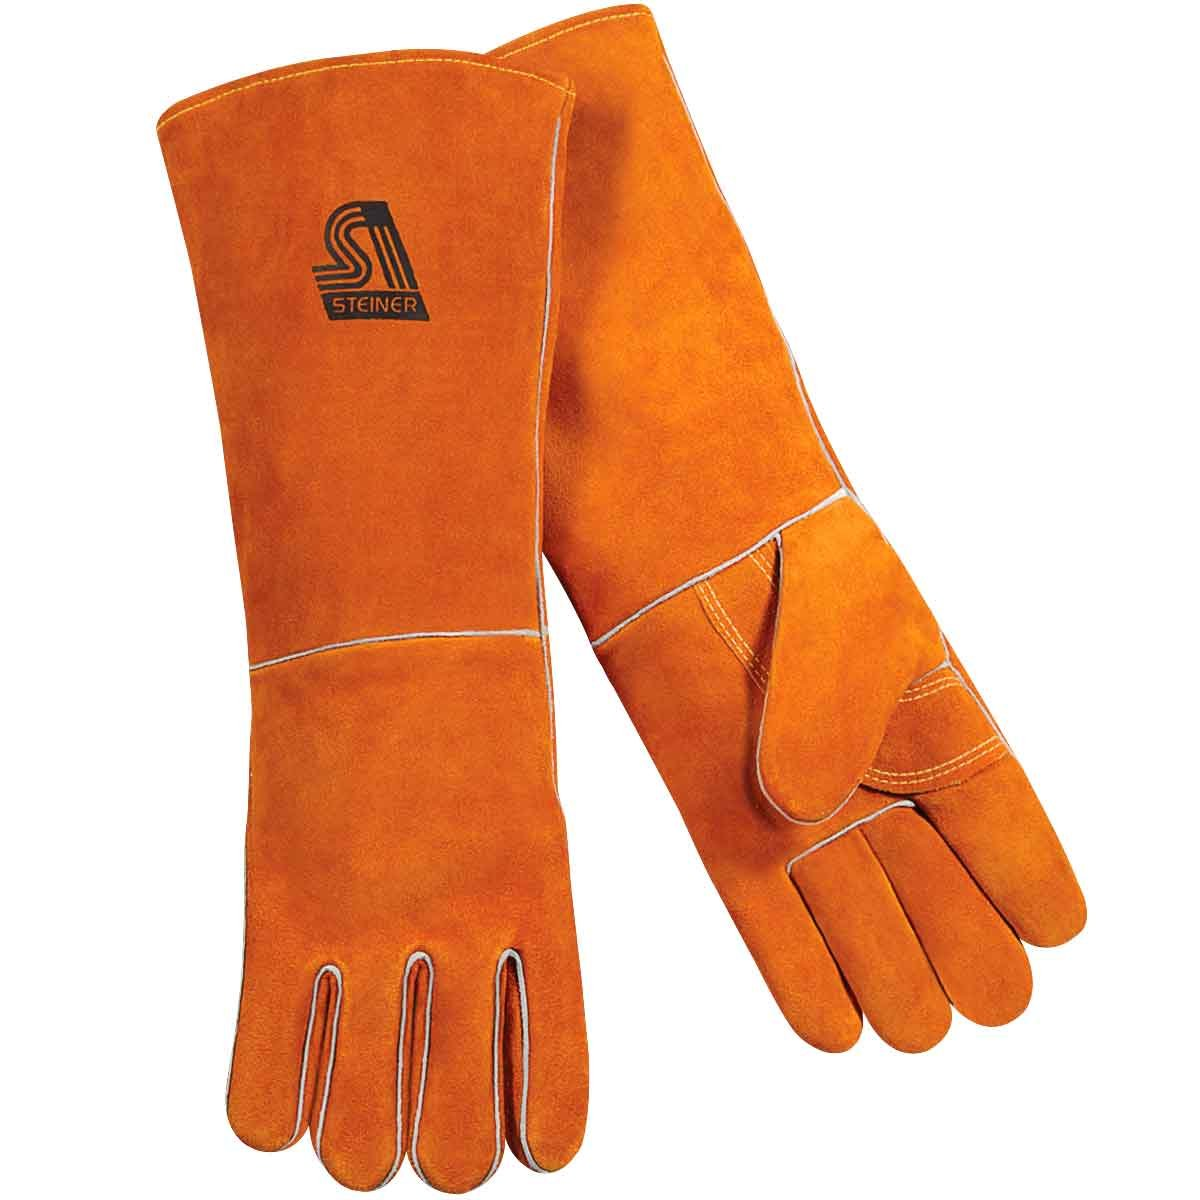 Steiner 21923-L Welding Gloves, Burnt orange Y-Series 23-Inch Length Shoulder Split Cowhide, Foam Lined, Large by Steiner (Image #1)